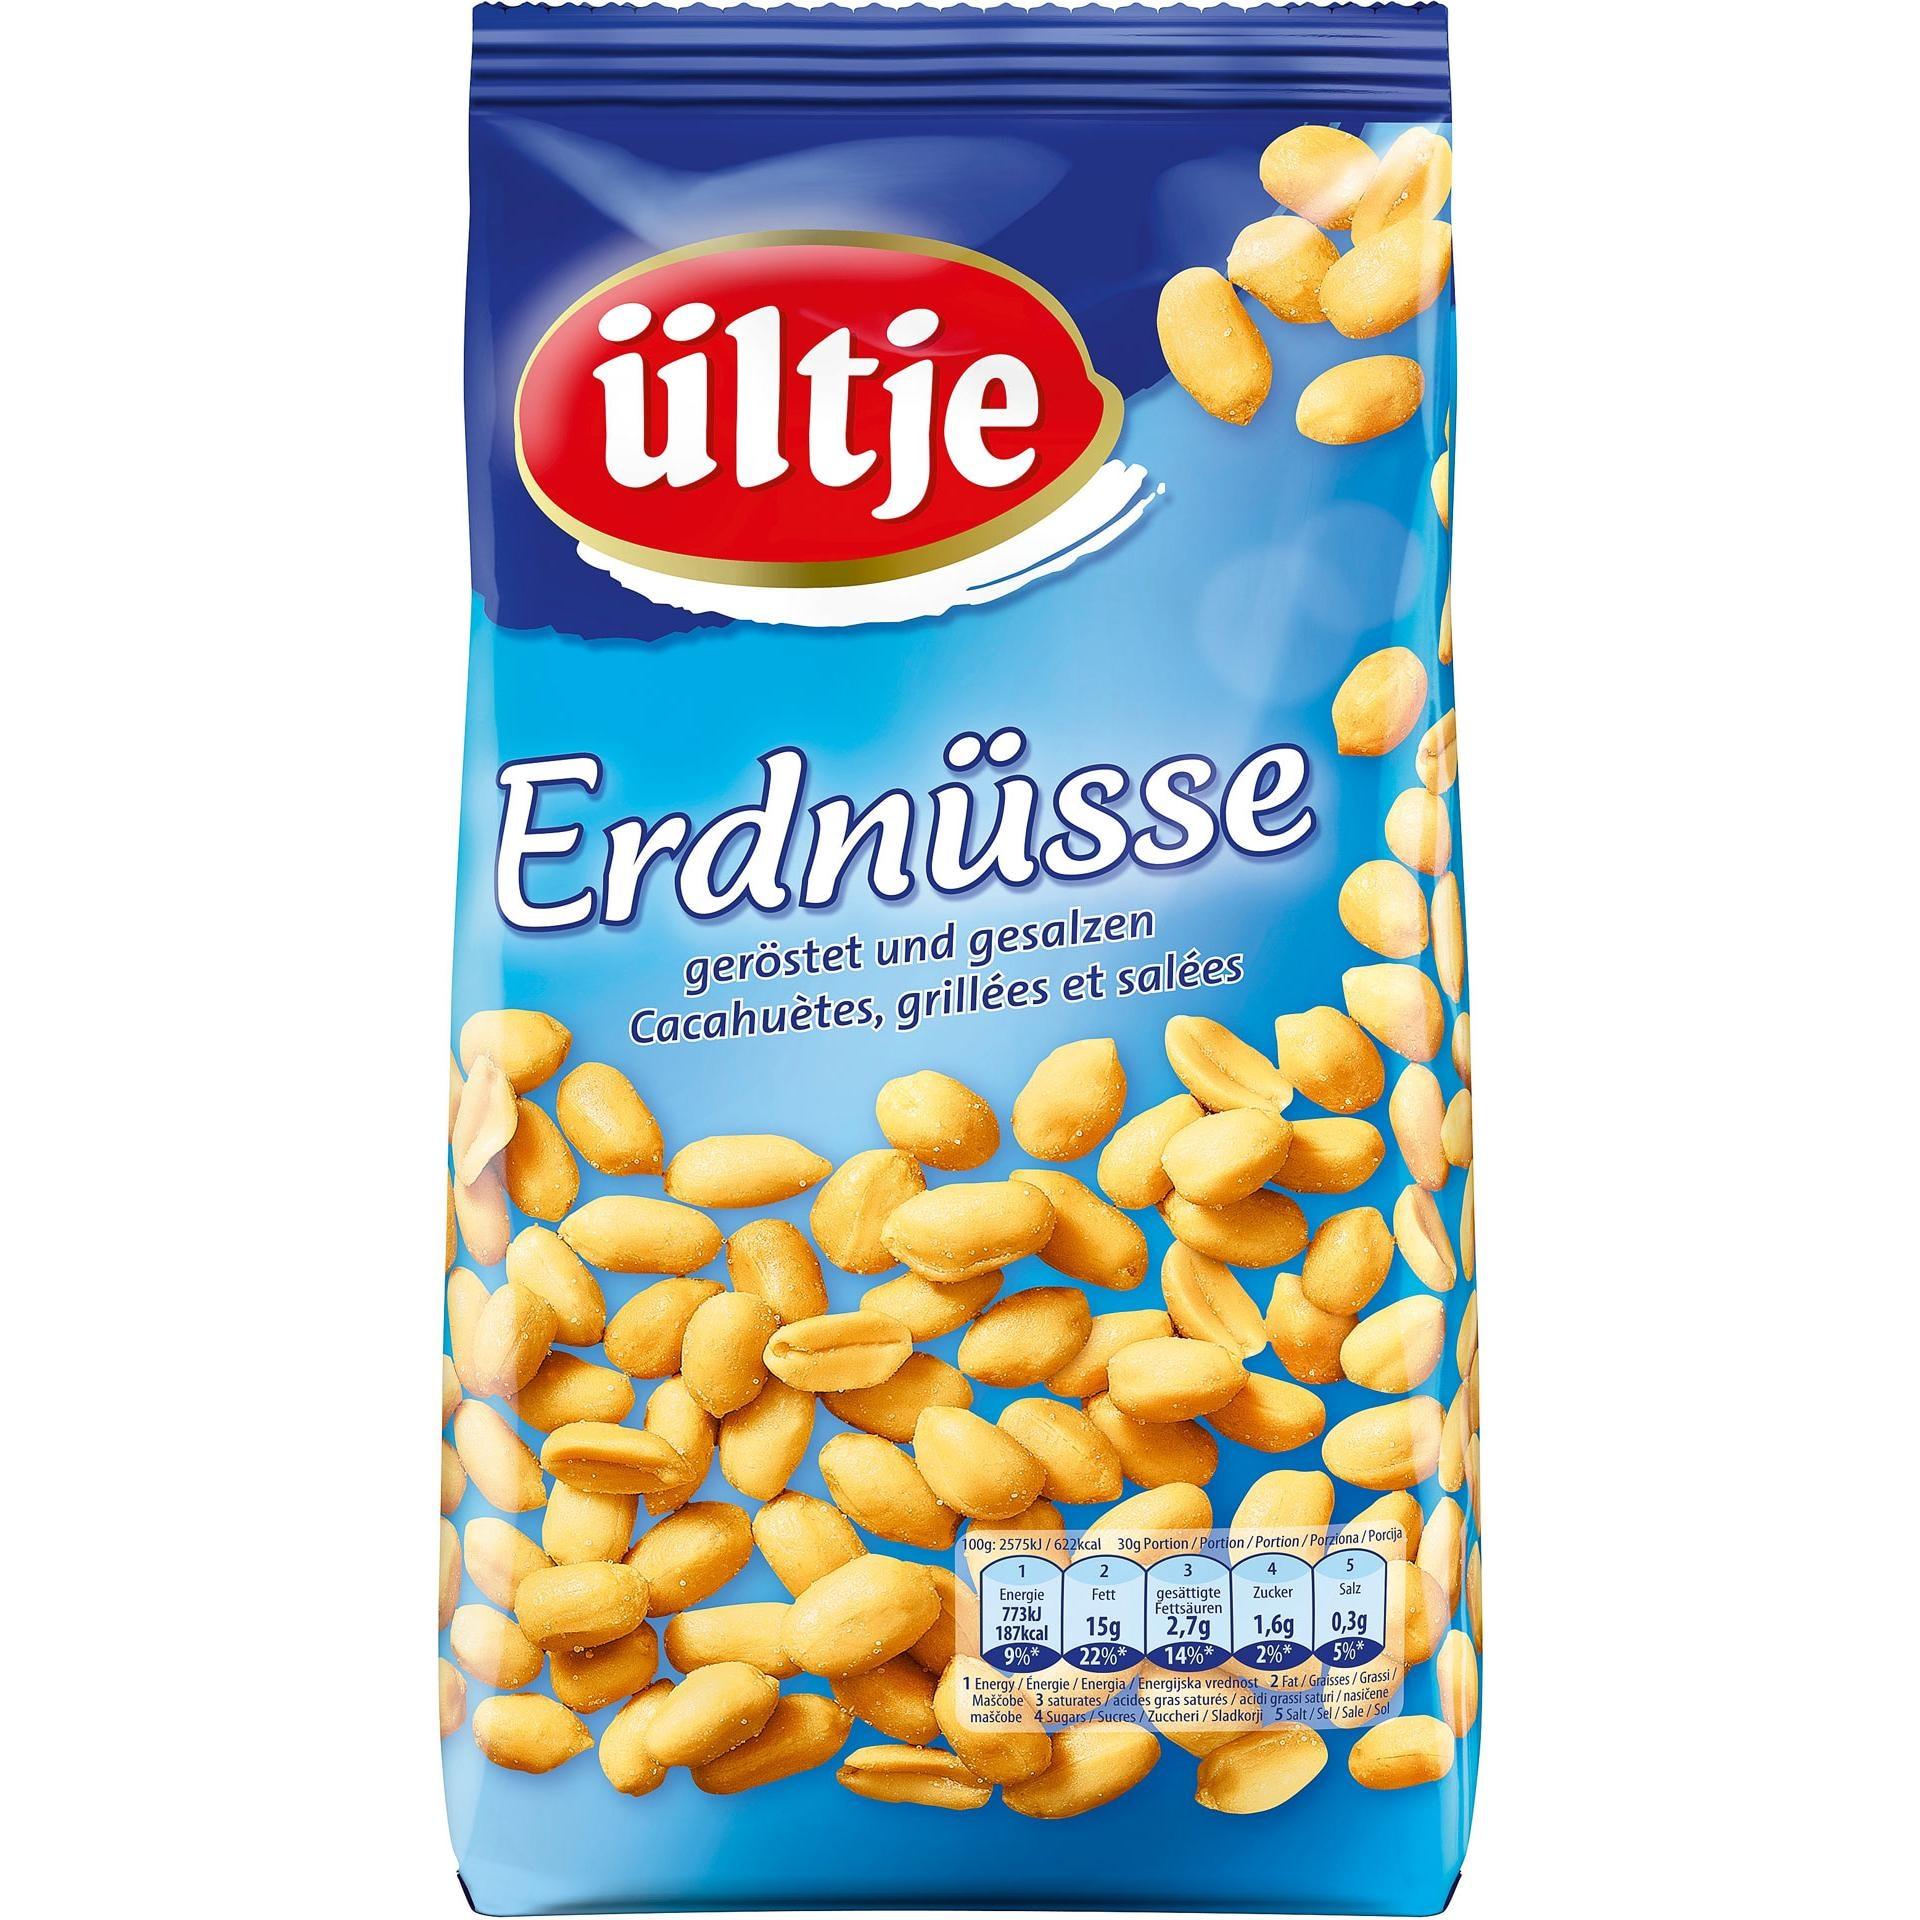 Ültje - Erdnüsse geröstet und gesalzen Nüsse Snack - 1kg